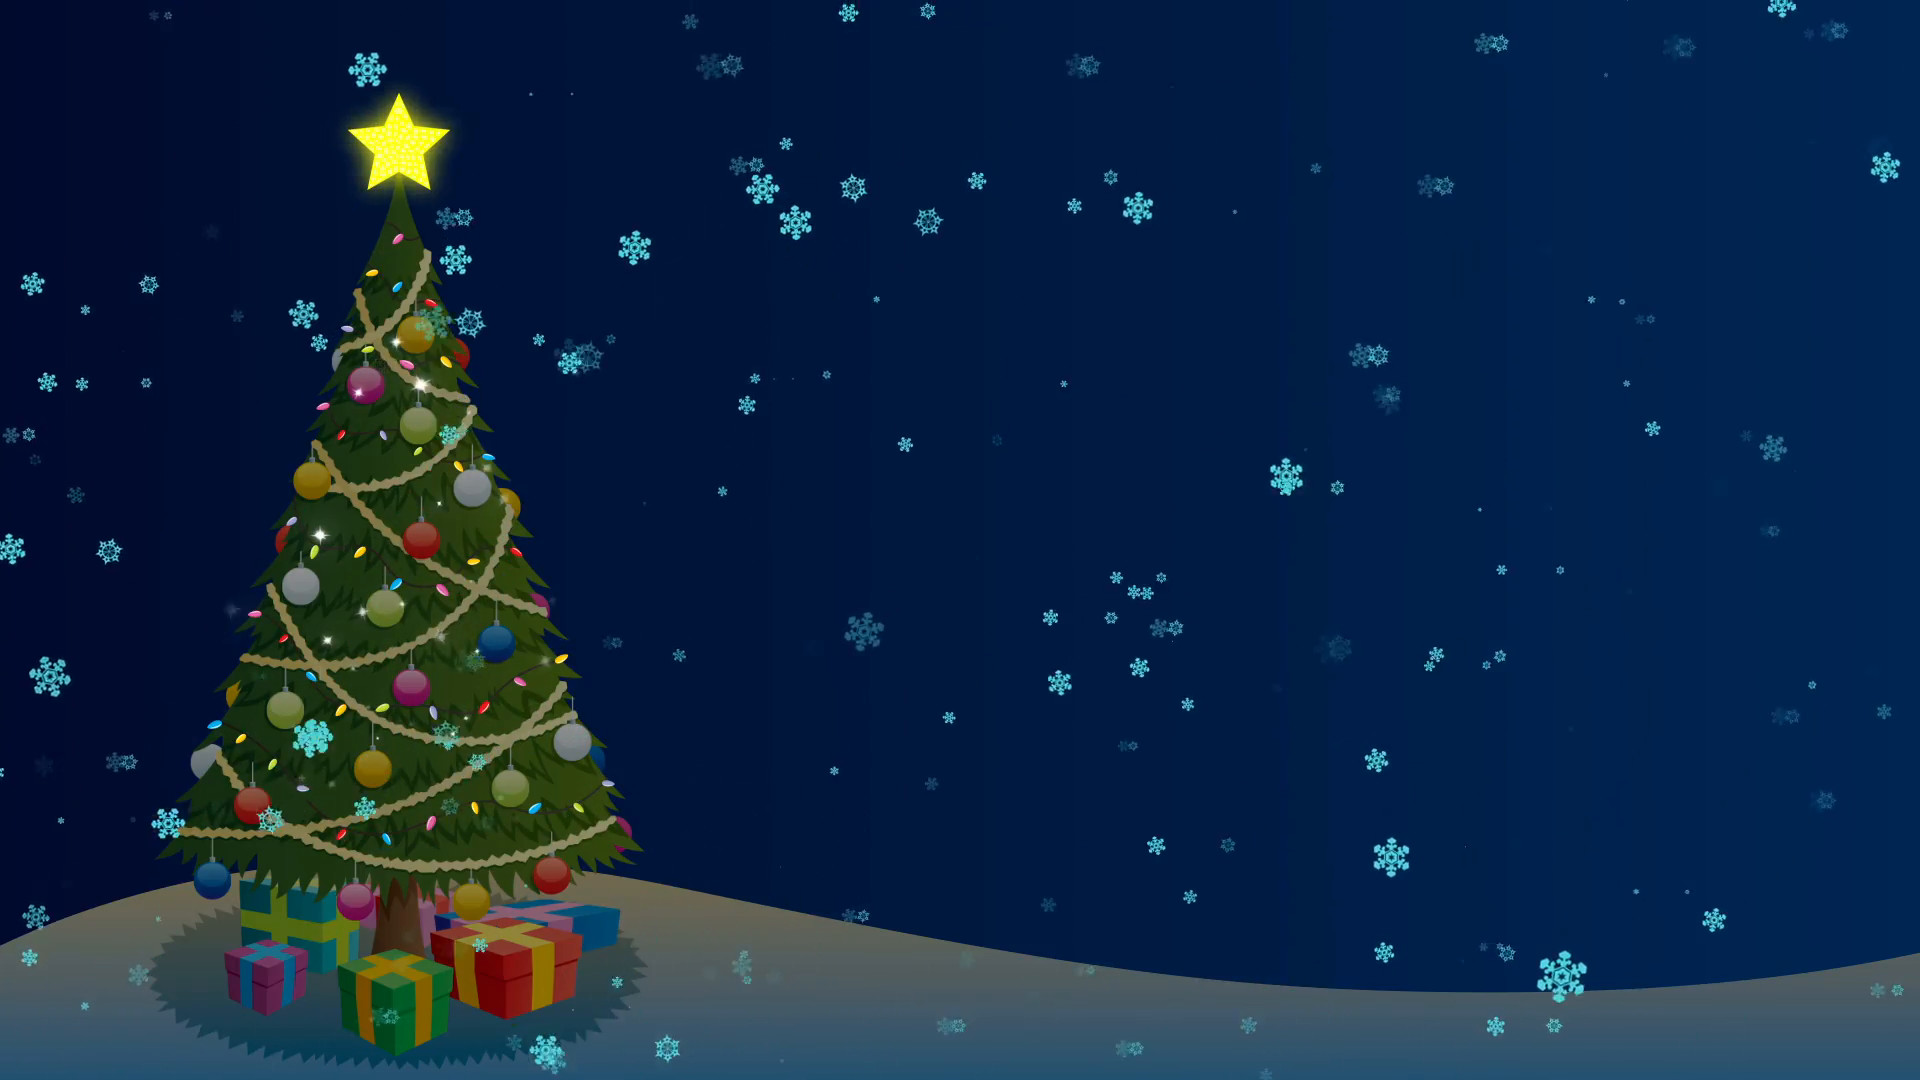 Animated Cartoon Christmas Tree Wallpaper